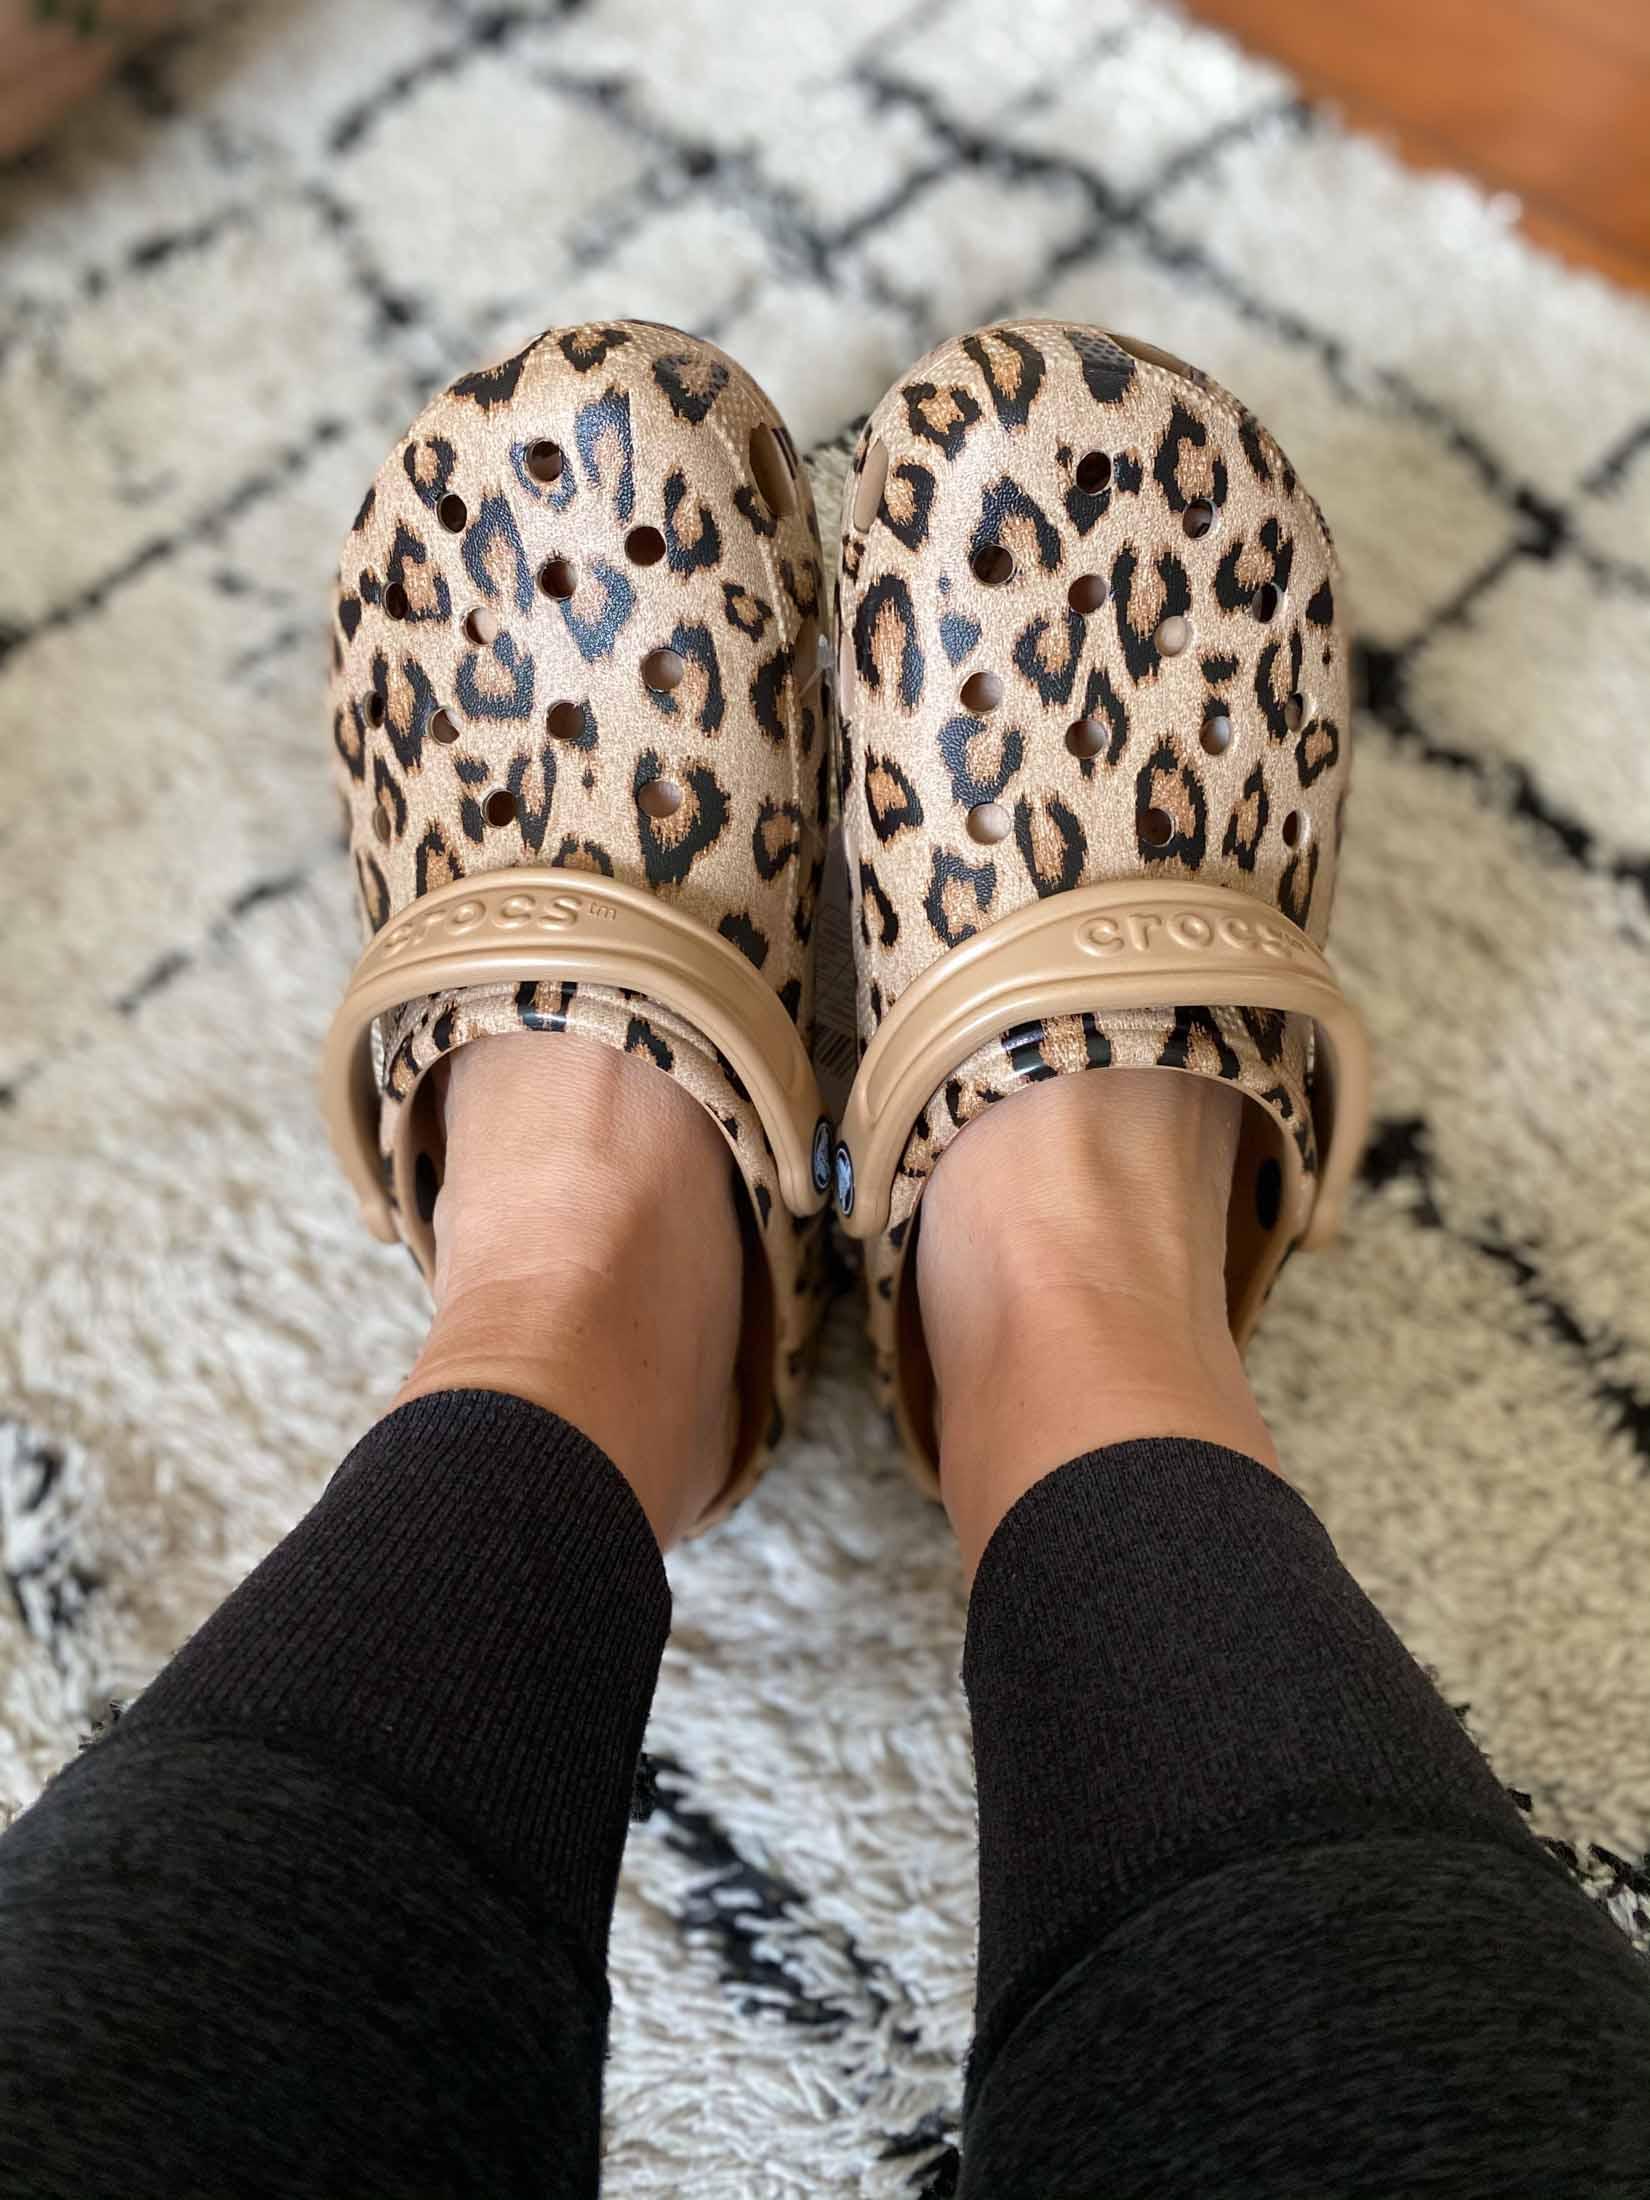 Interesting details make clogs & clog sandals way more cool + chic, thus less dowdy. Think: studs, prints, heels, tread soles & more cute deets.